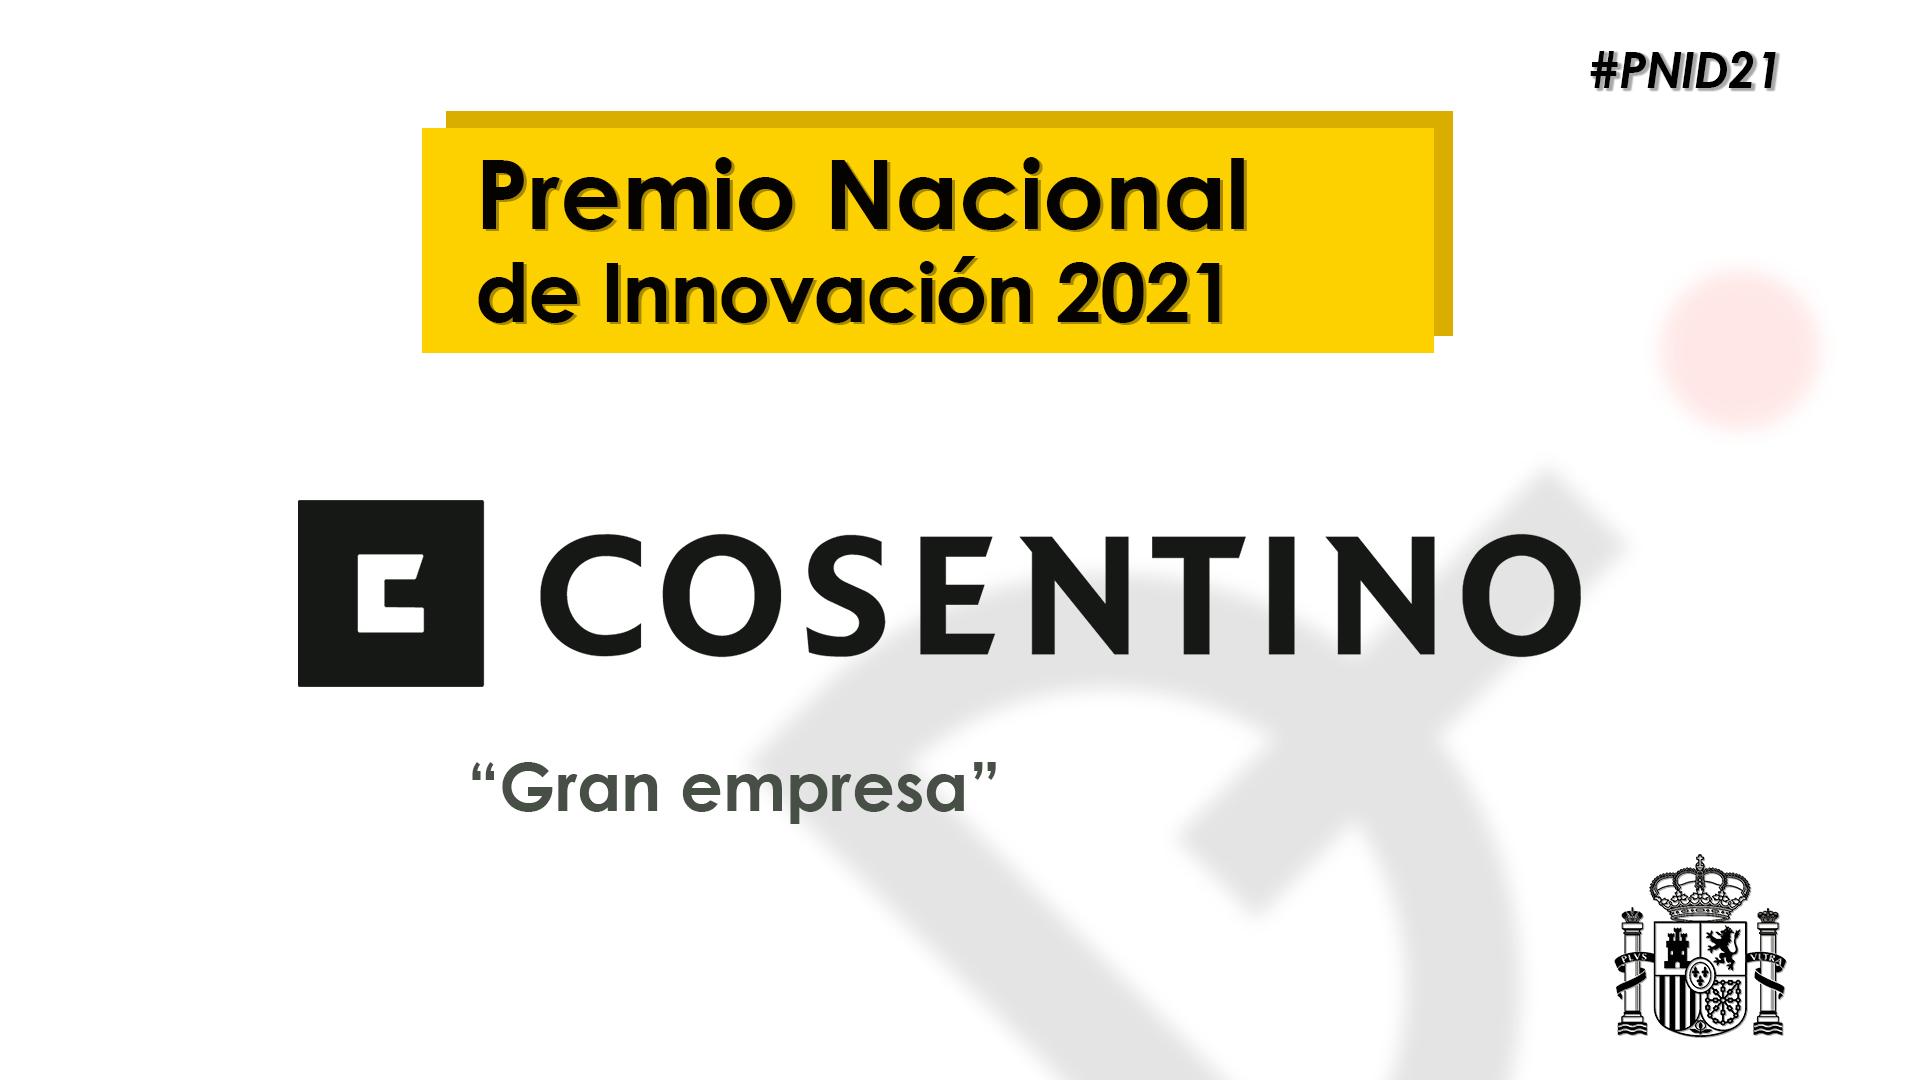 Image of Pnid21 award in Cosentino, winner of the Spanish National Innovation Award 2021 - Cosentino